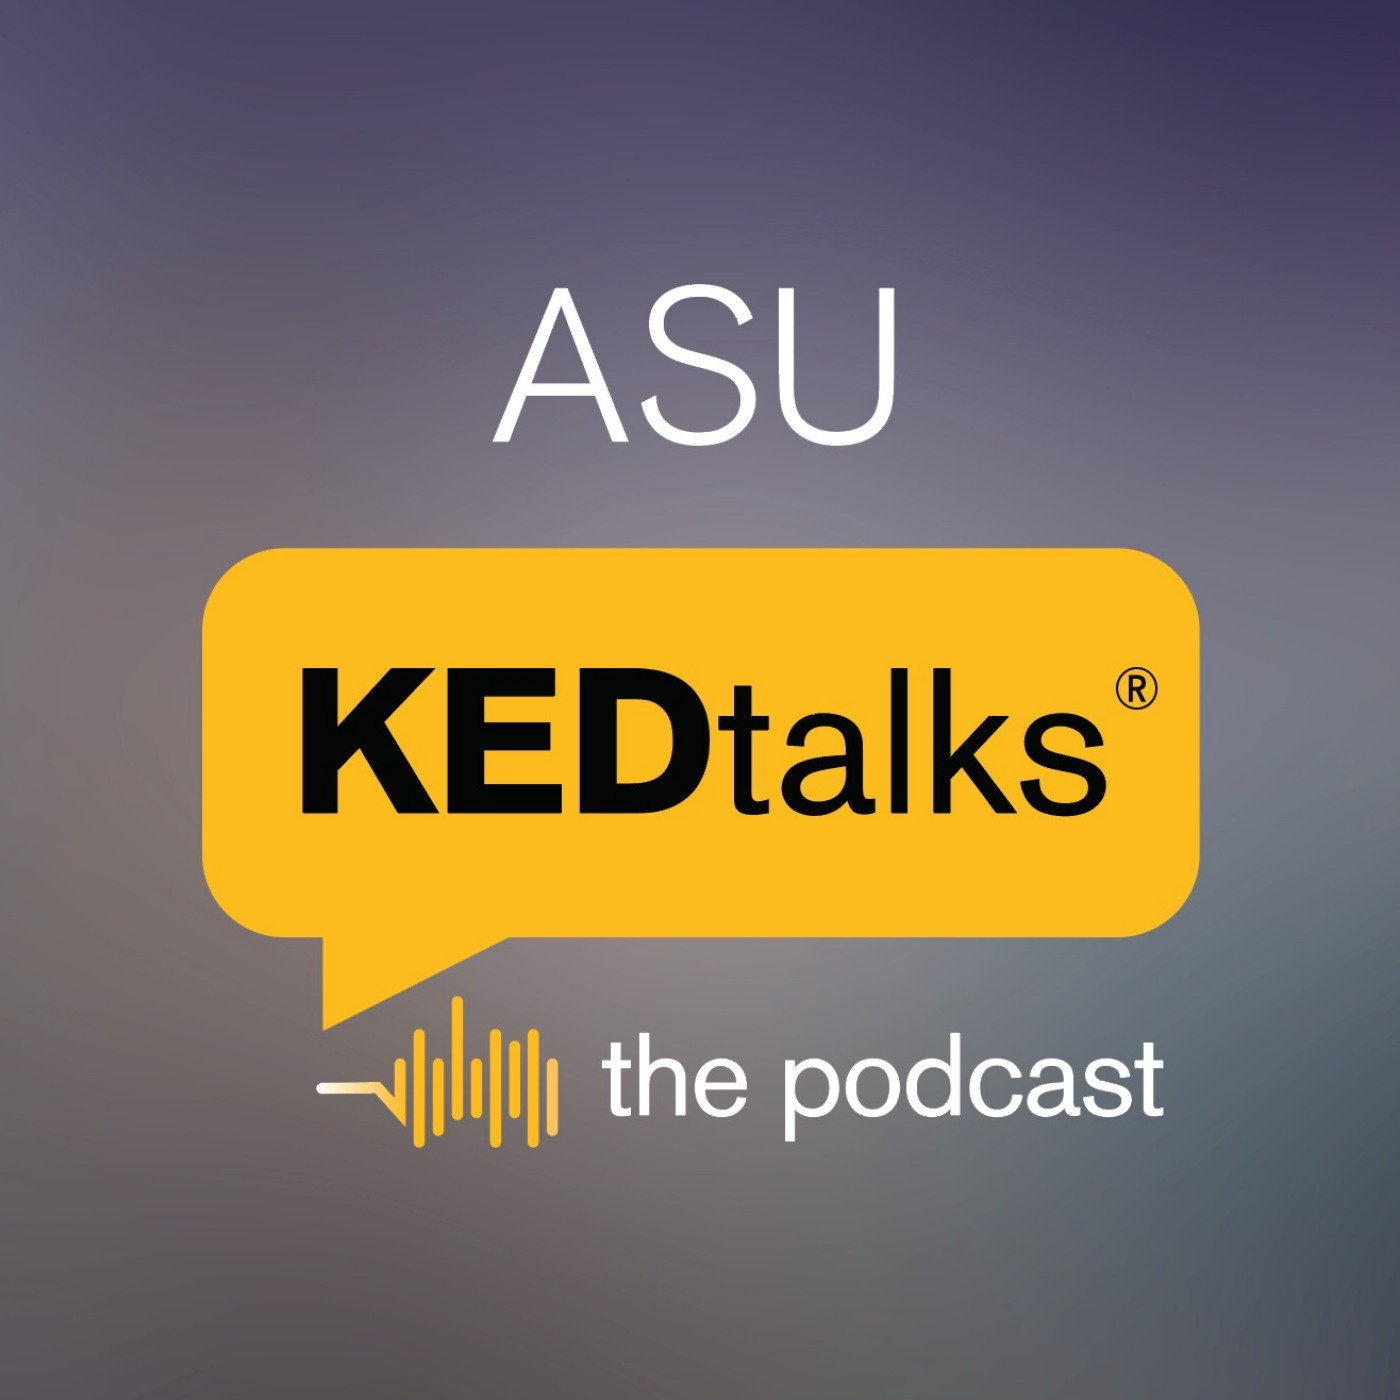 ASU KEDtalks: The Podcast